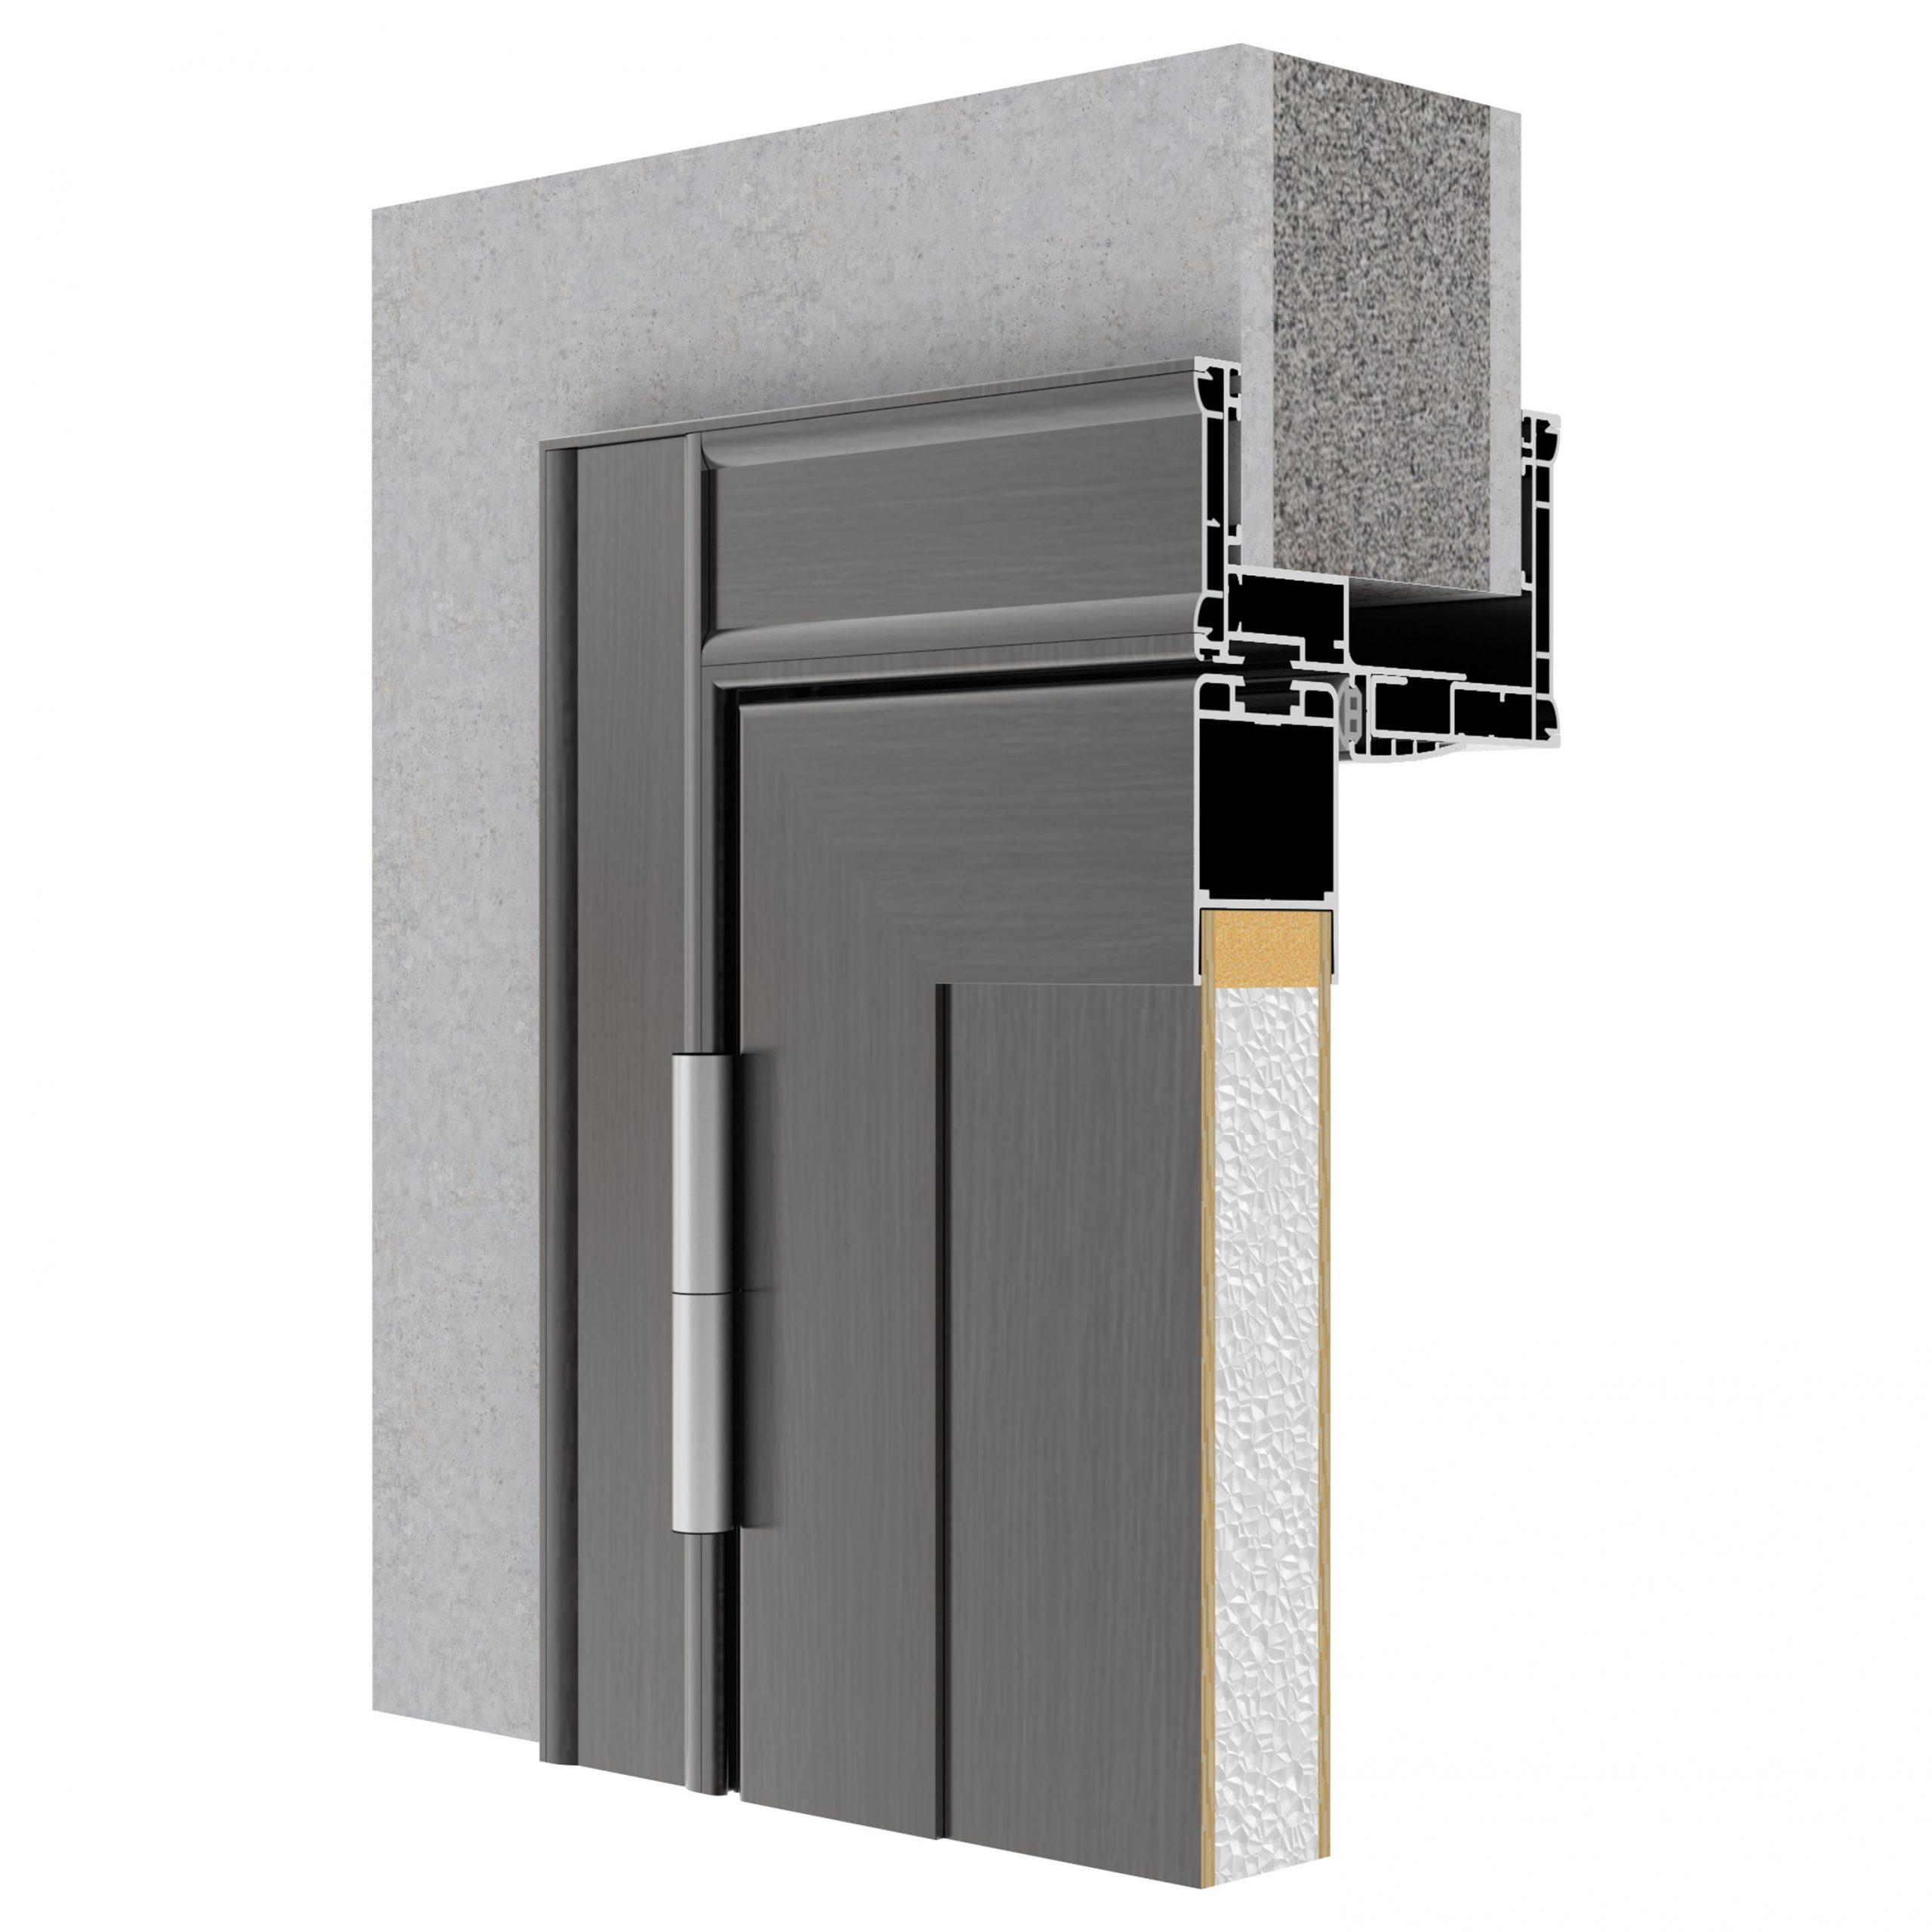 https://www.allpaint.it/wp-content/uploads/2021/07/porte-alluminio-90pannello-allpaint-scaled.jpg